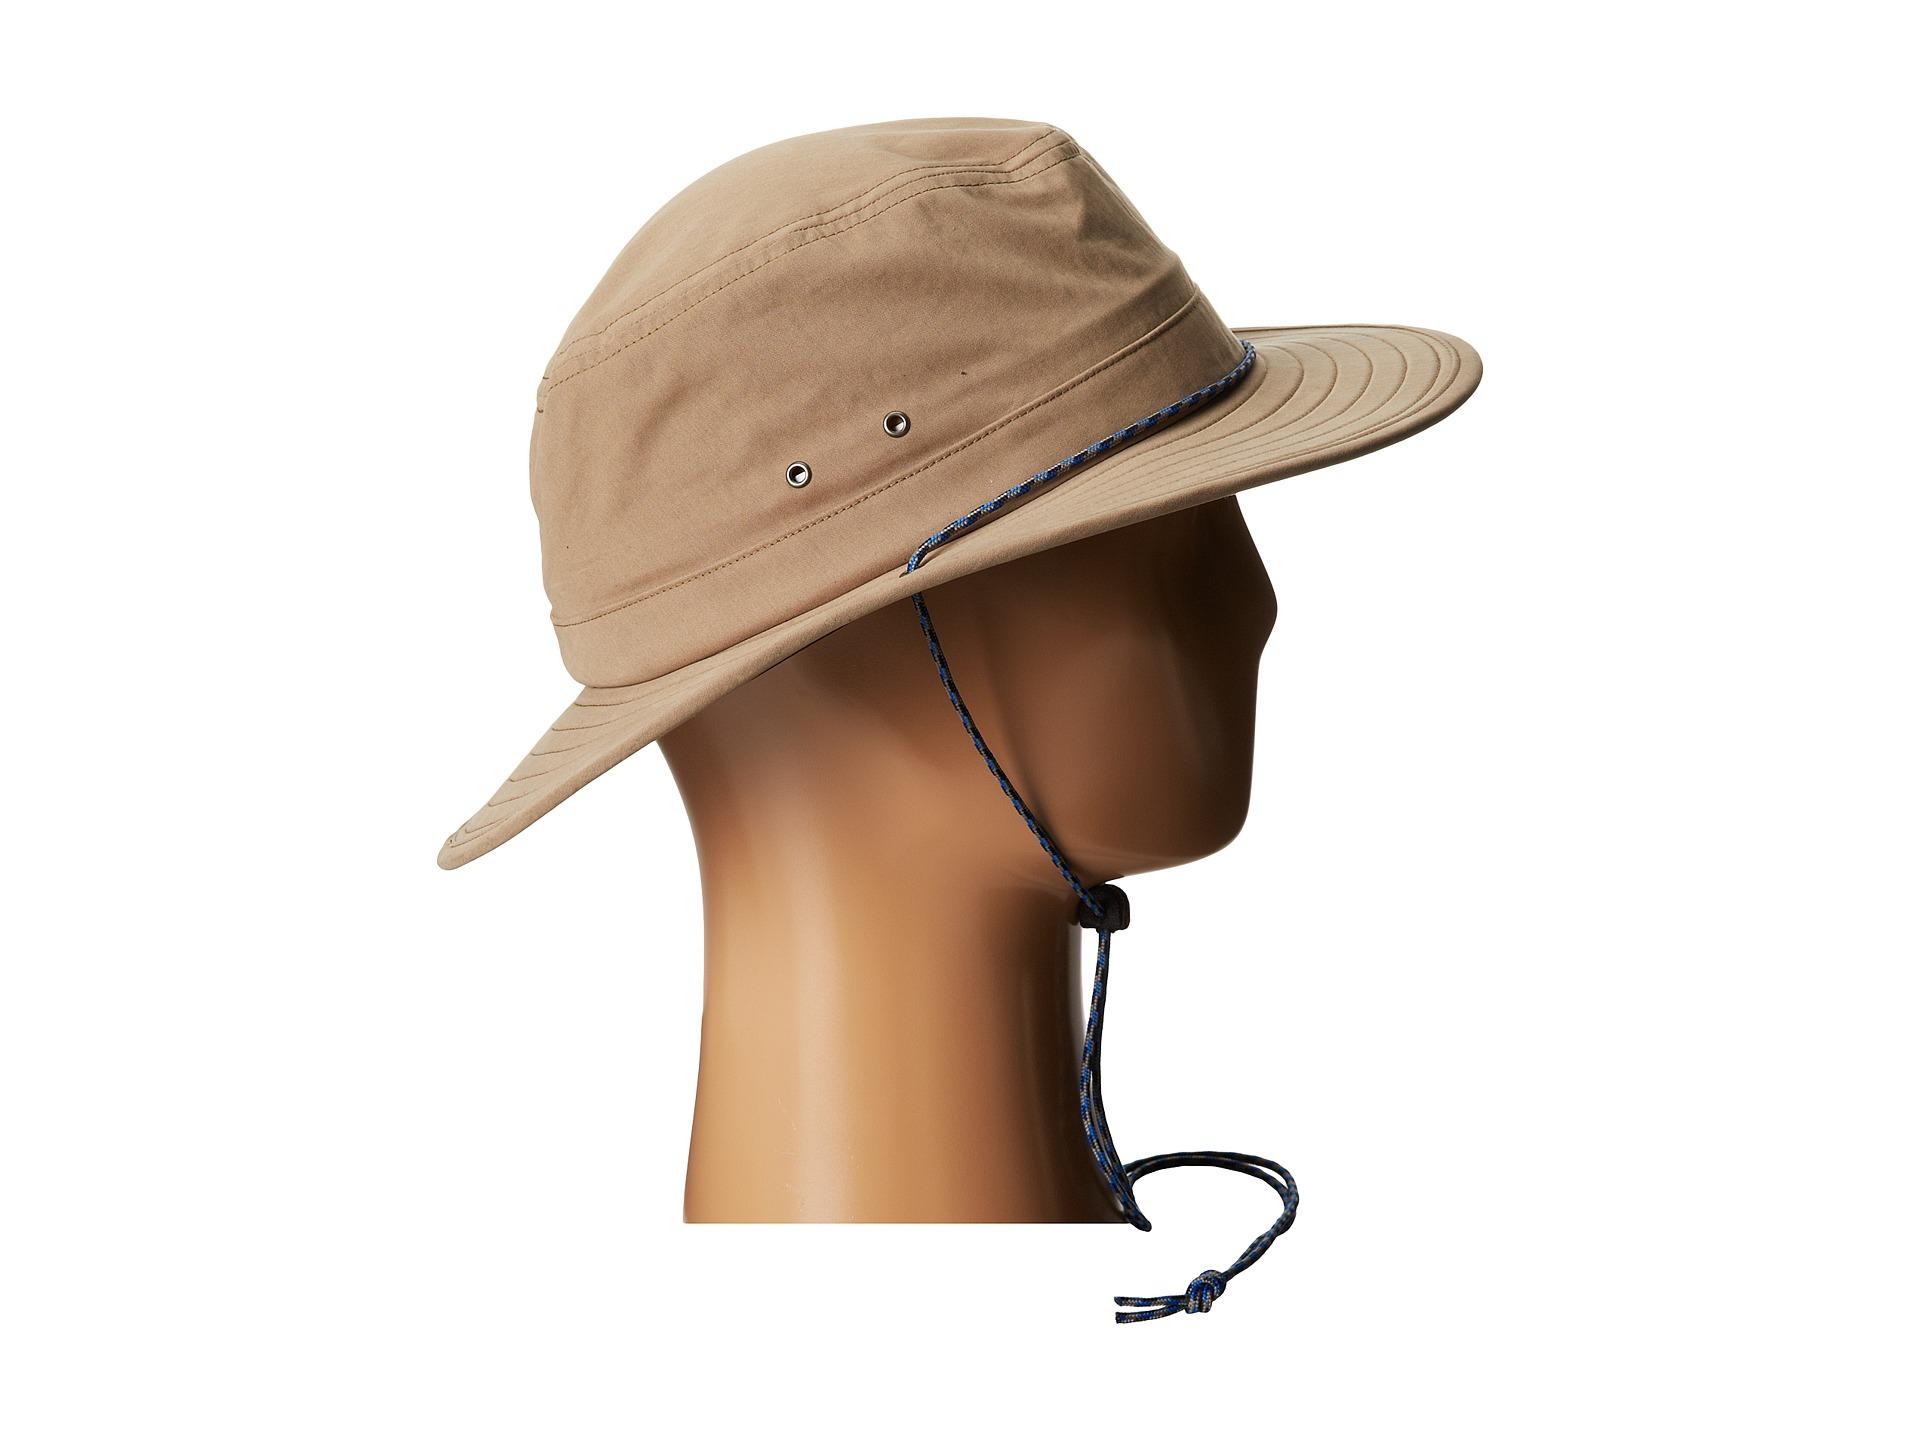 d3fab57fc1755 Patagonia Tenpenny Hat in Gray - Lyst